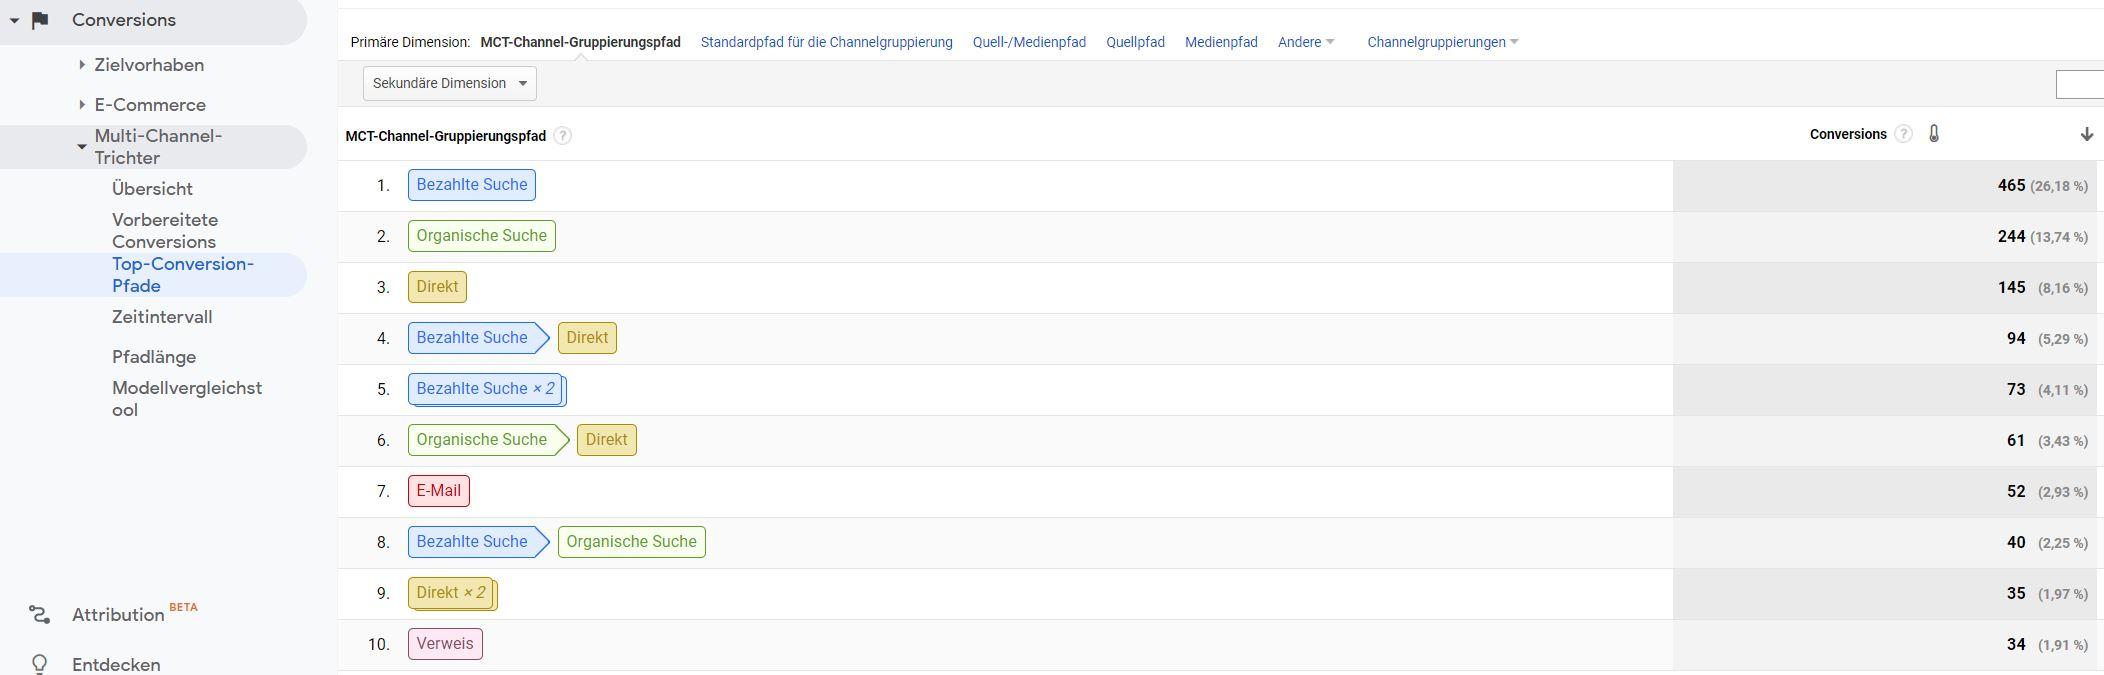 Conversion Pfade in Google Analytics